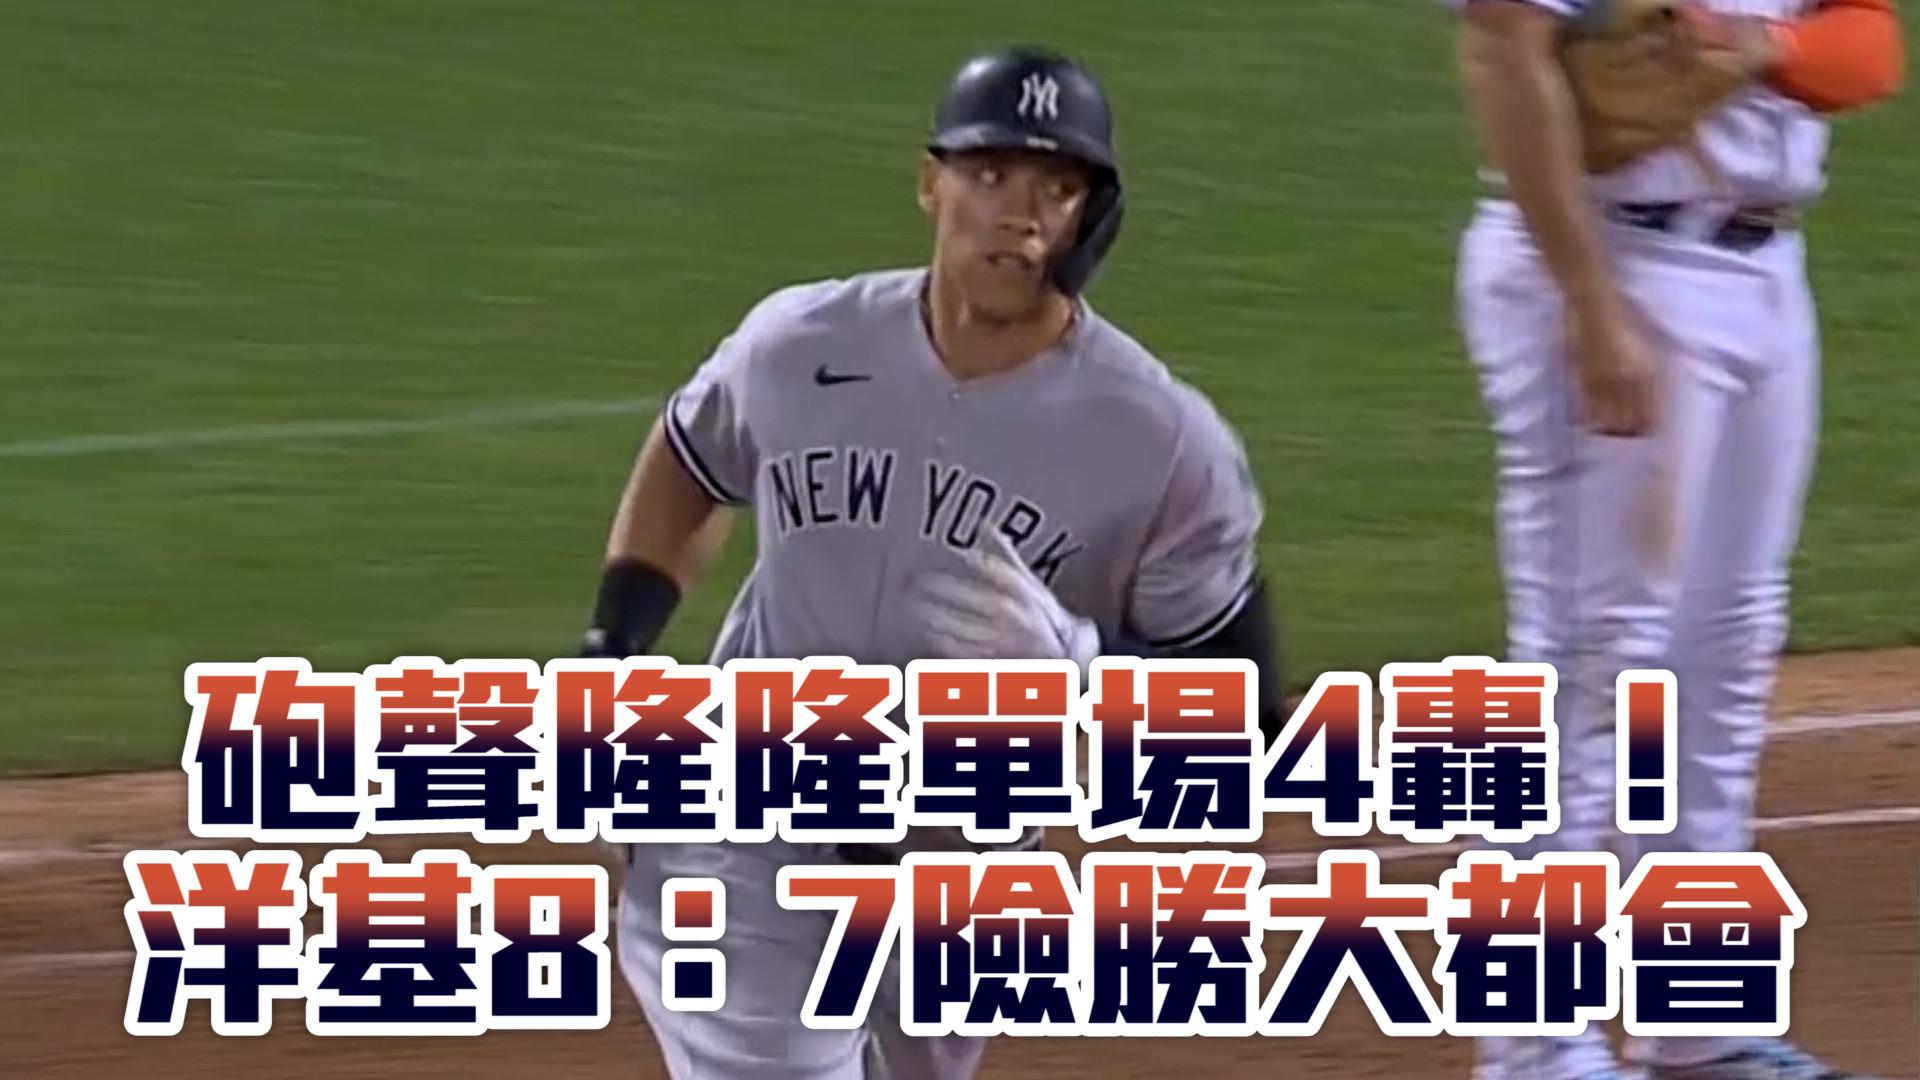 【MLB看愛爾達】砲聲隆隆單場4轟!洋基8:7險勝大都會 09/12